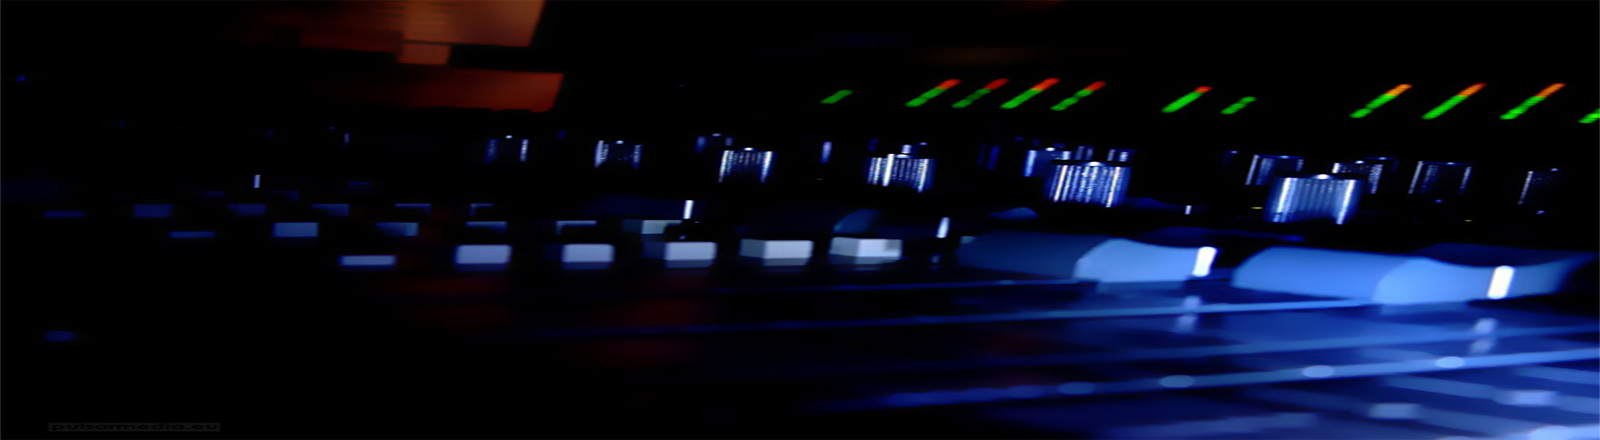 dj mixing board online